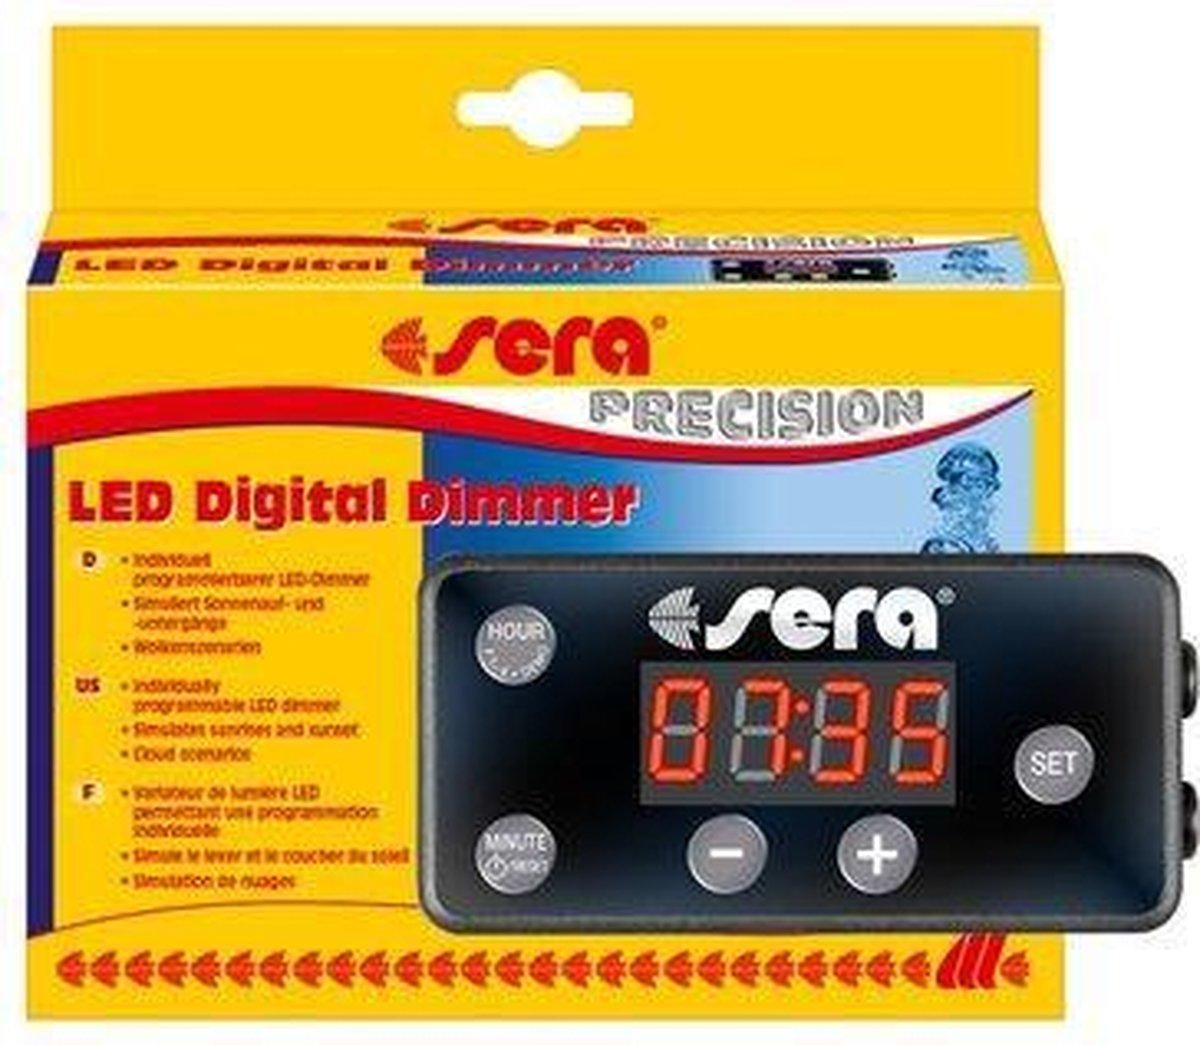 Sera LED Digital Dimmer - Sera